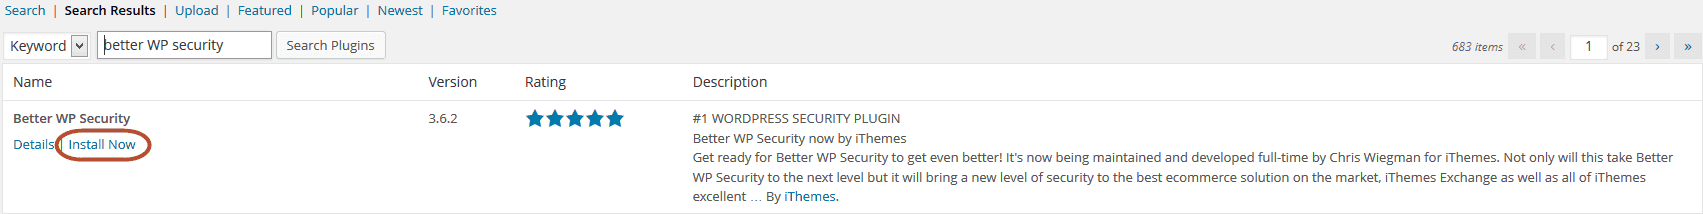 pluginresults